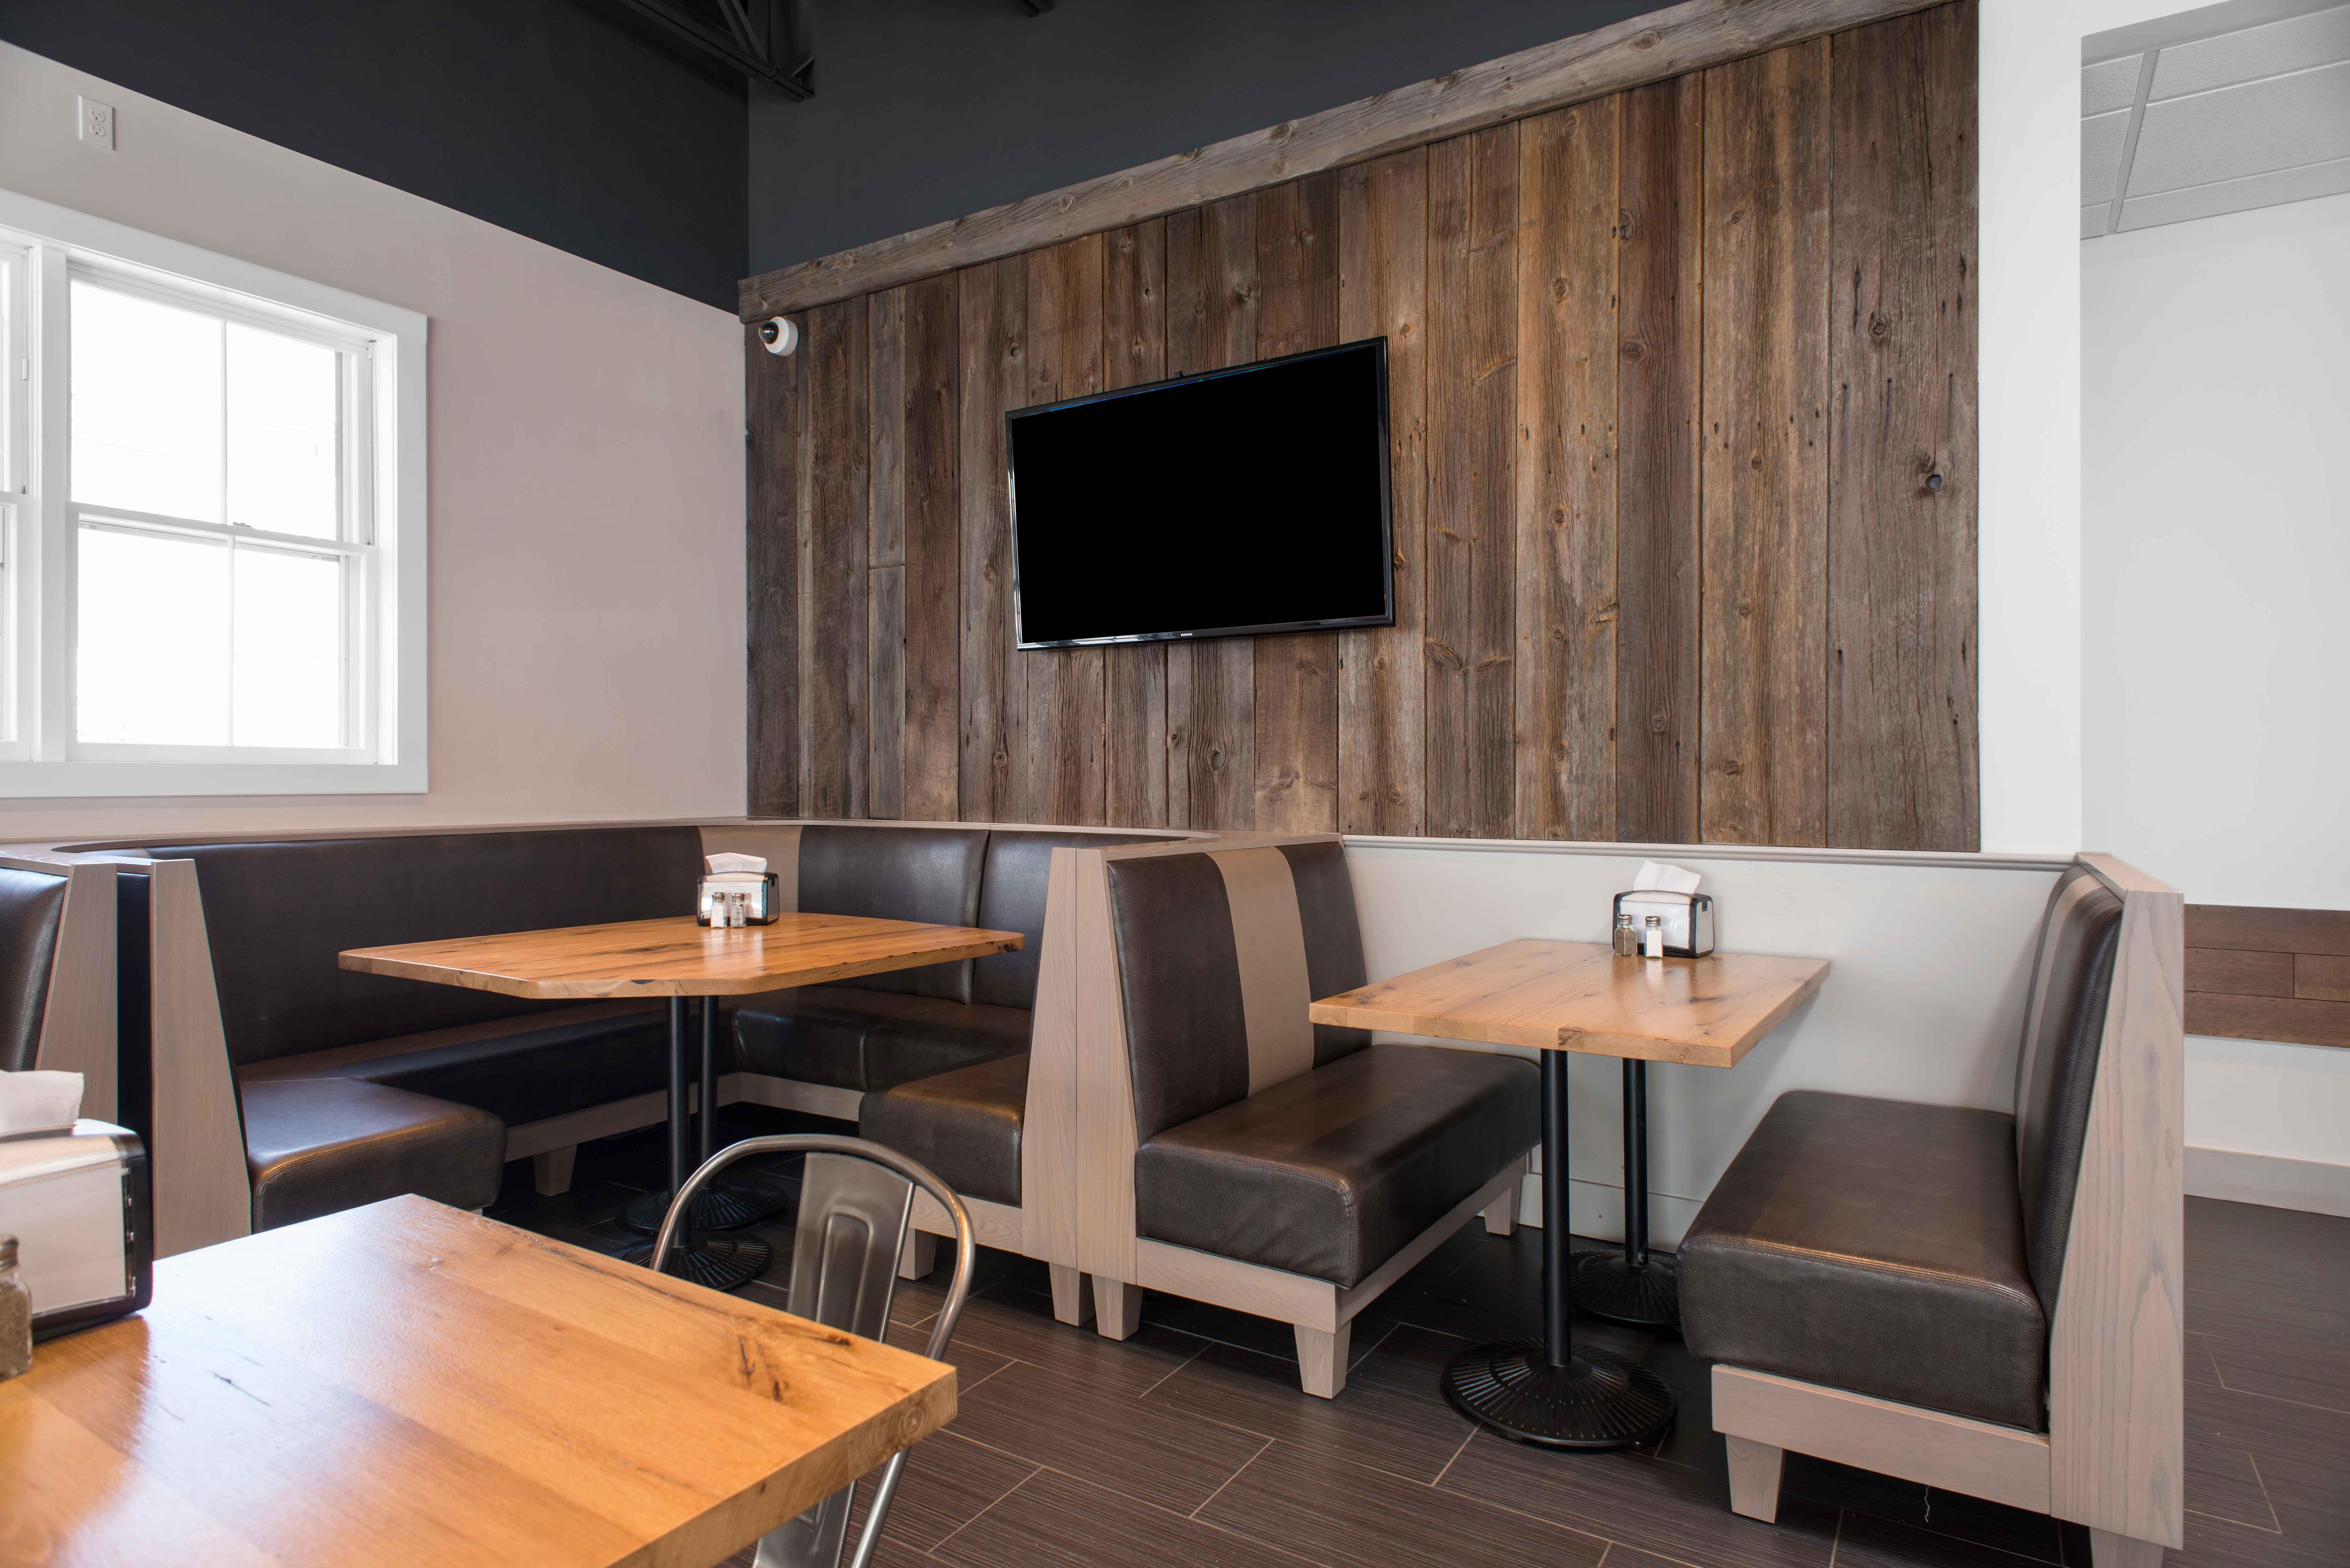 Reclaimed Barn Board Wall Paneling U0026 Reclaimed White Oak Tables In Pomodori  Restaurant, Georgetown,